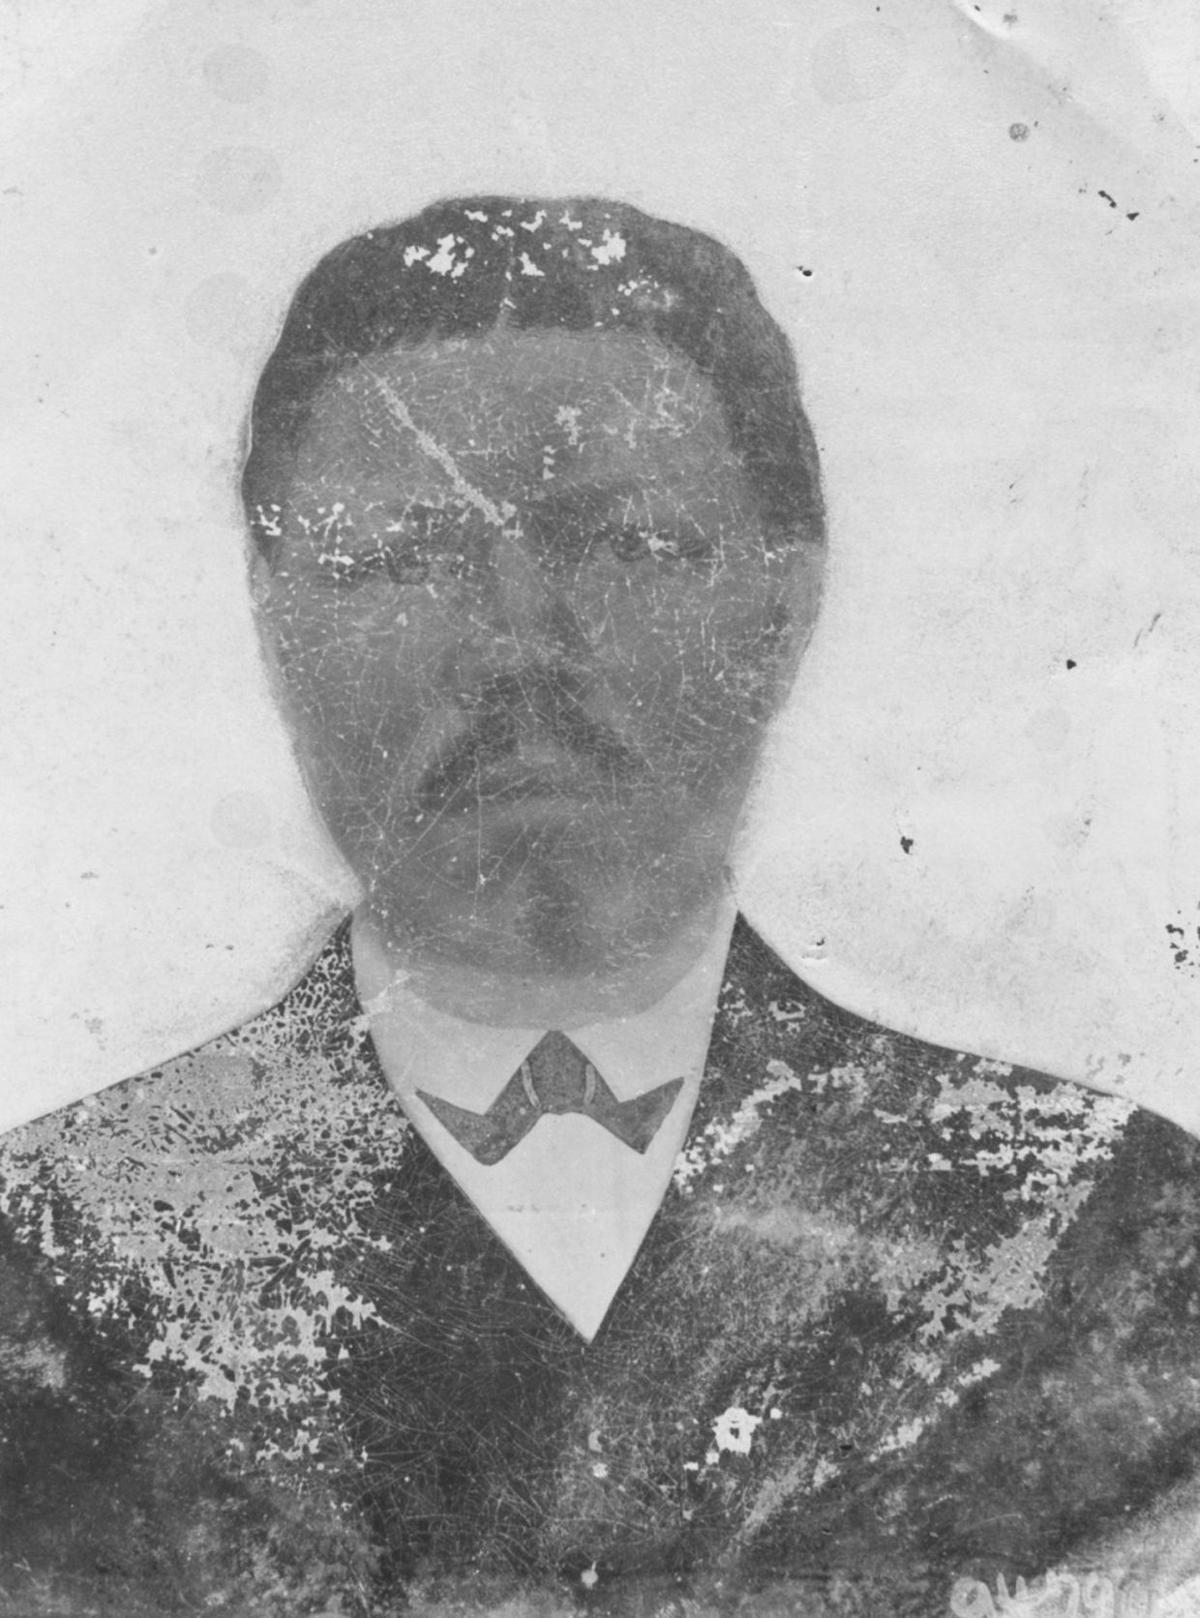 J. W. Fairley